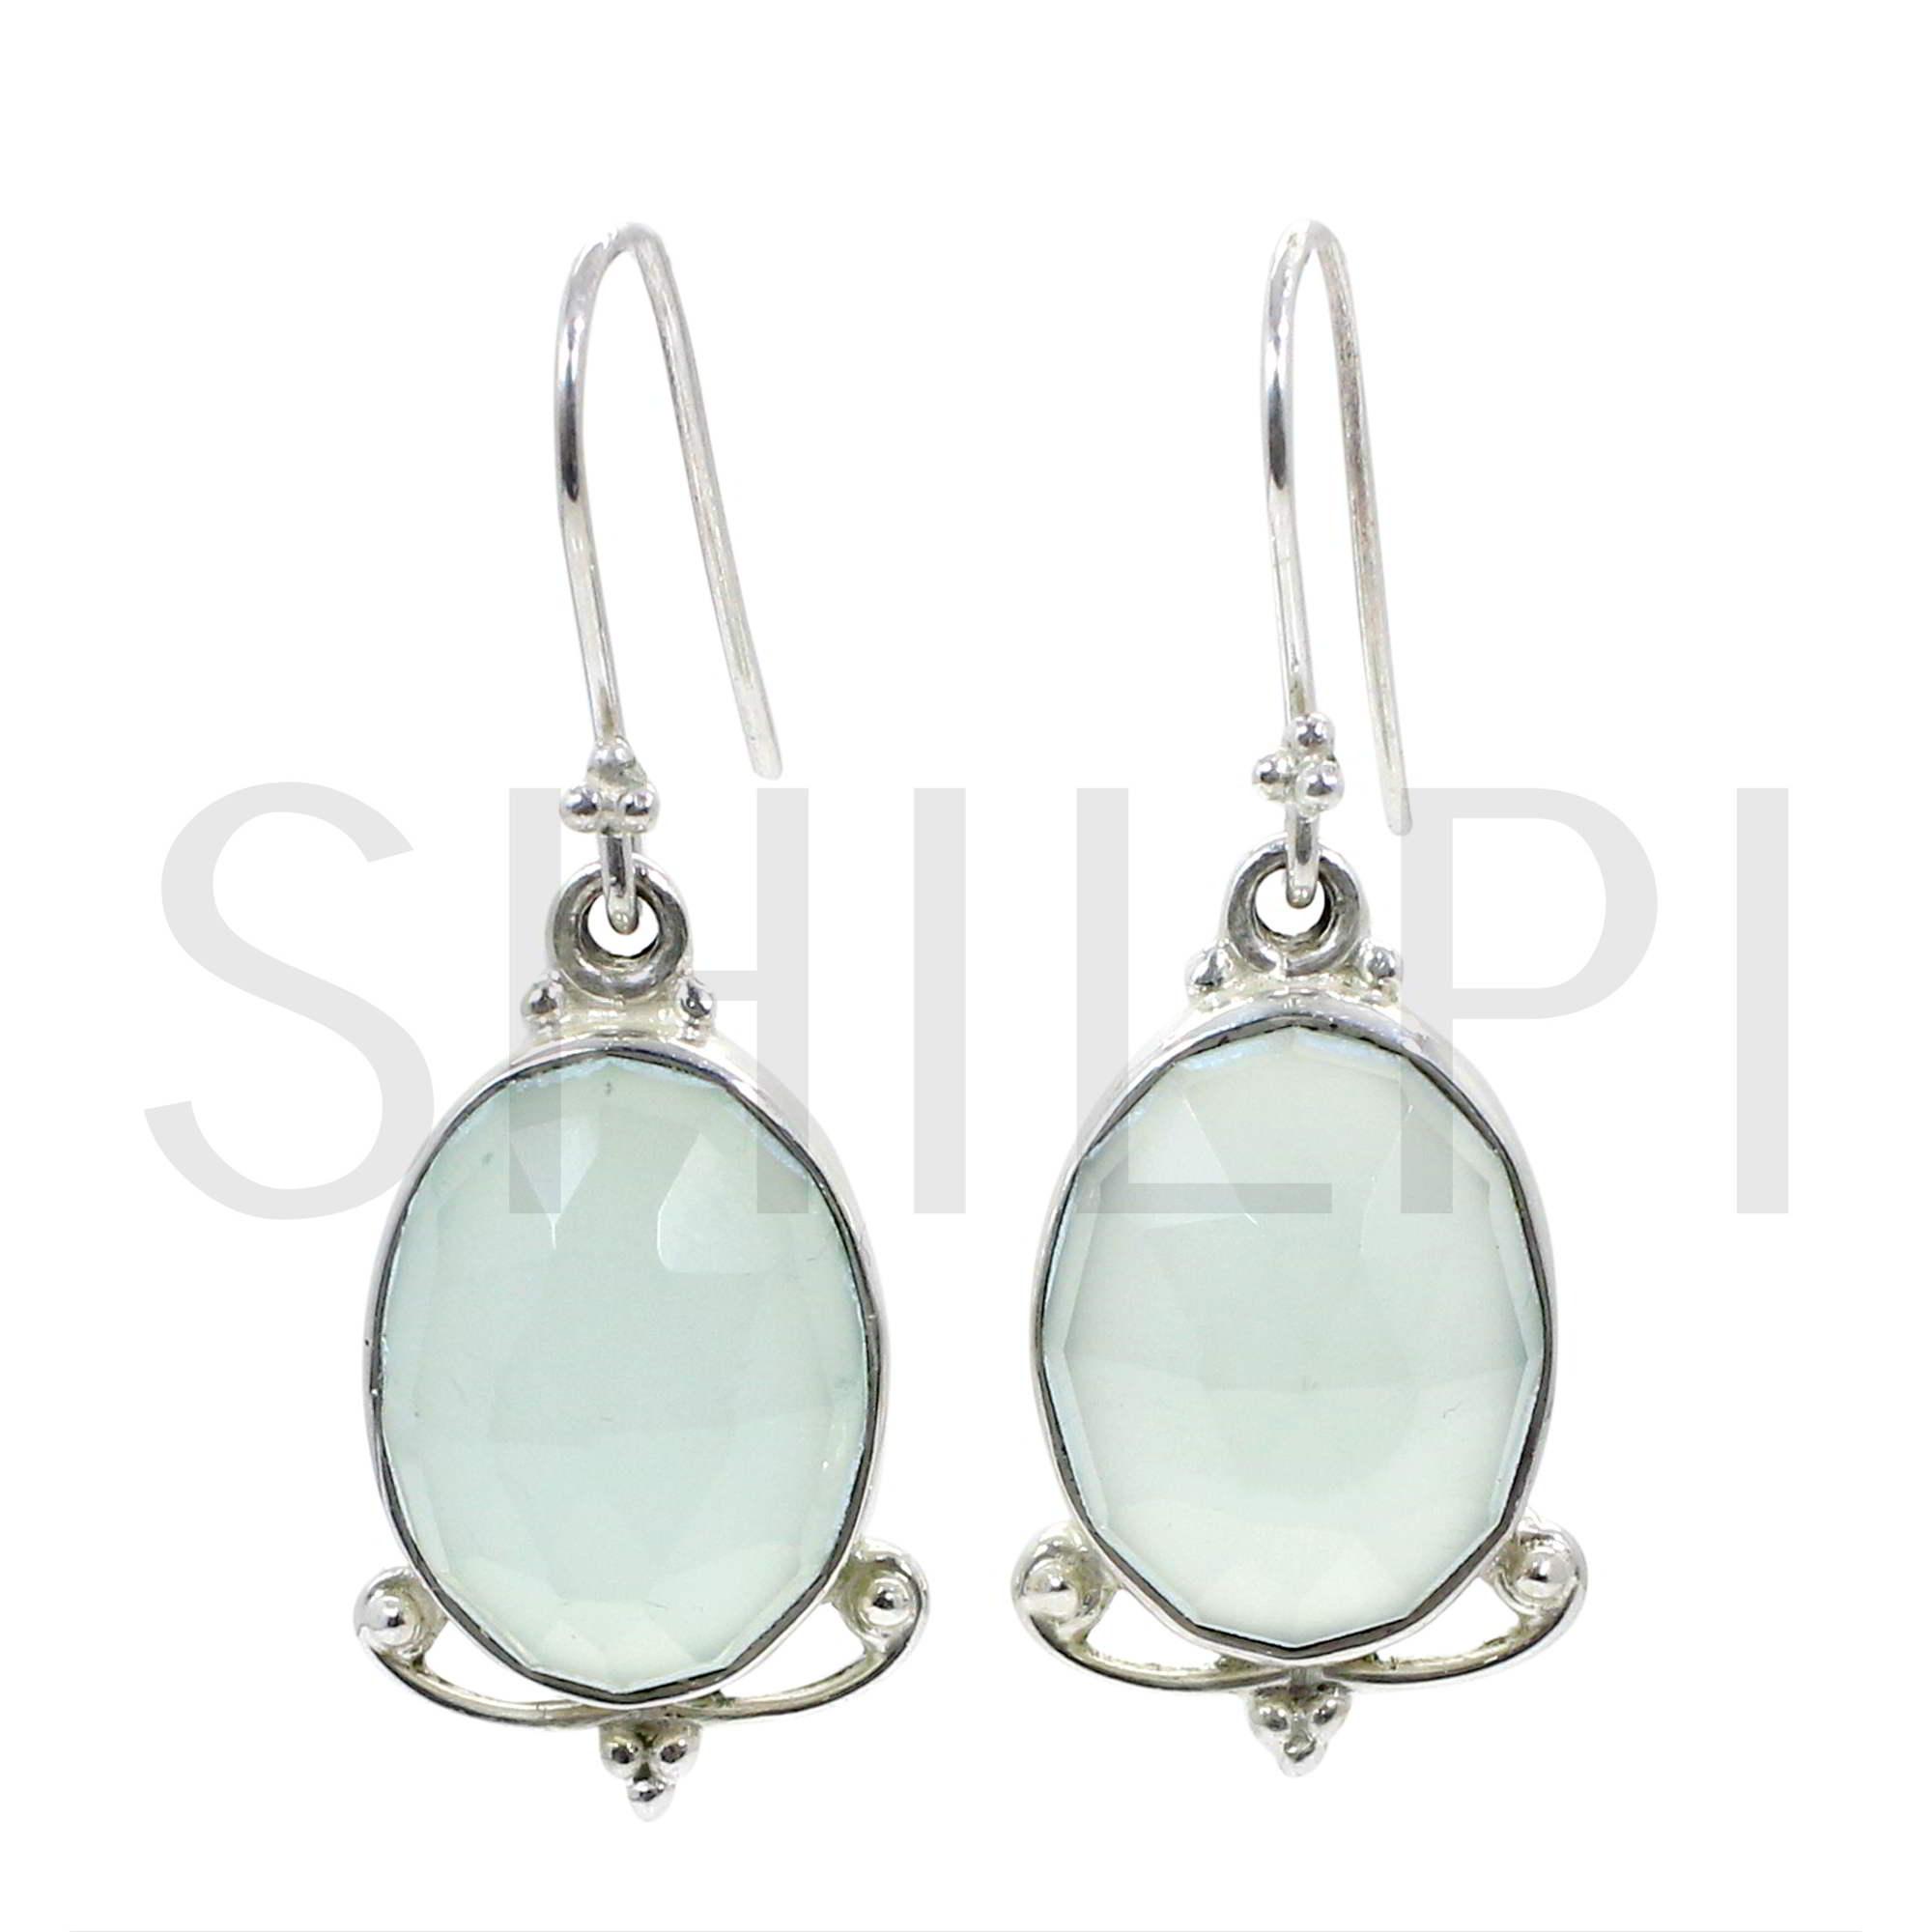 Natural Aqua Chalcedony 925 Sterling Silver Dangle Earrings